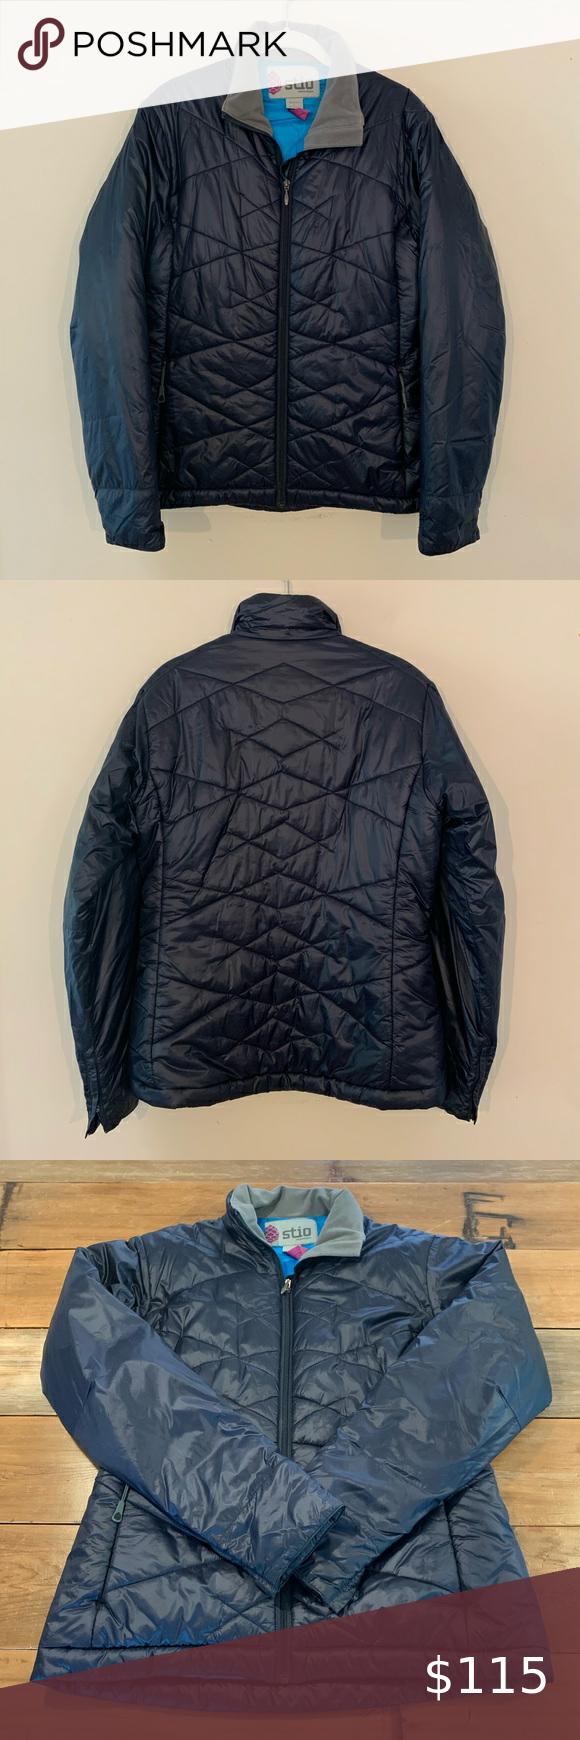 Stio Women S Navy Down Puffer Jacket Size L Navy Women Jackets Puffer Jackets [ 1740 x 580 Pixel ]